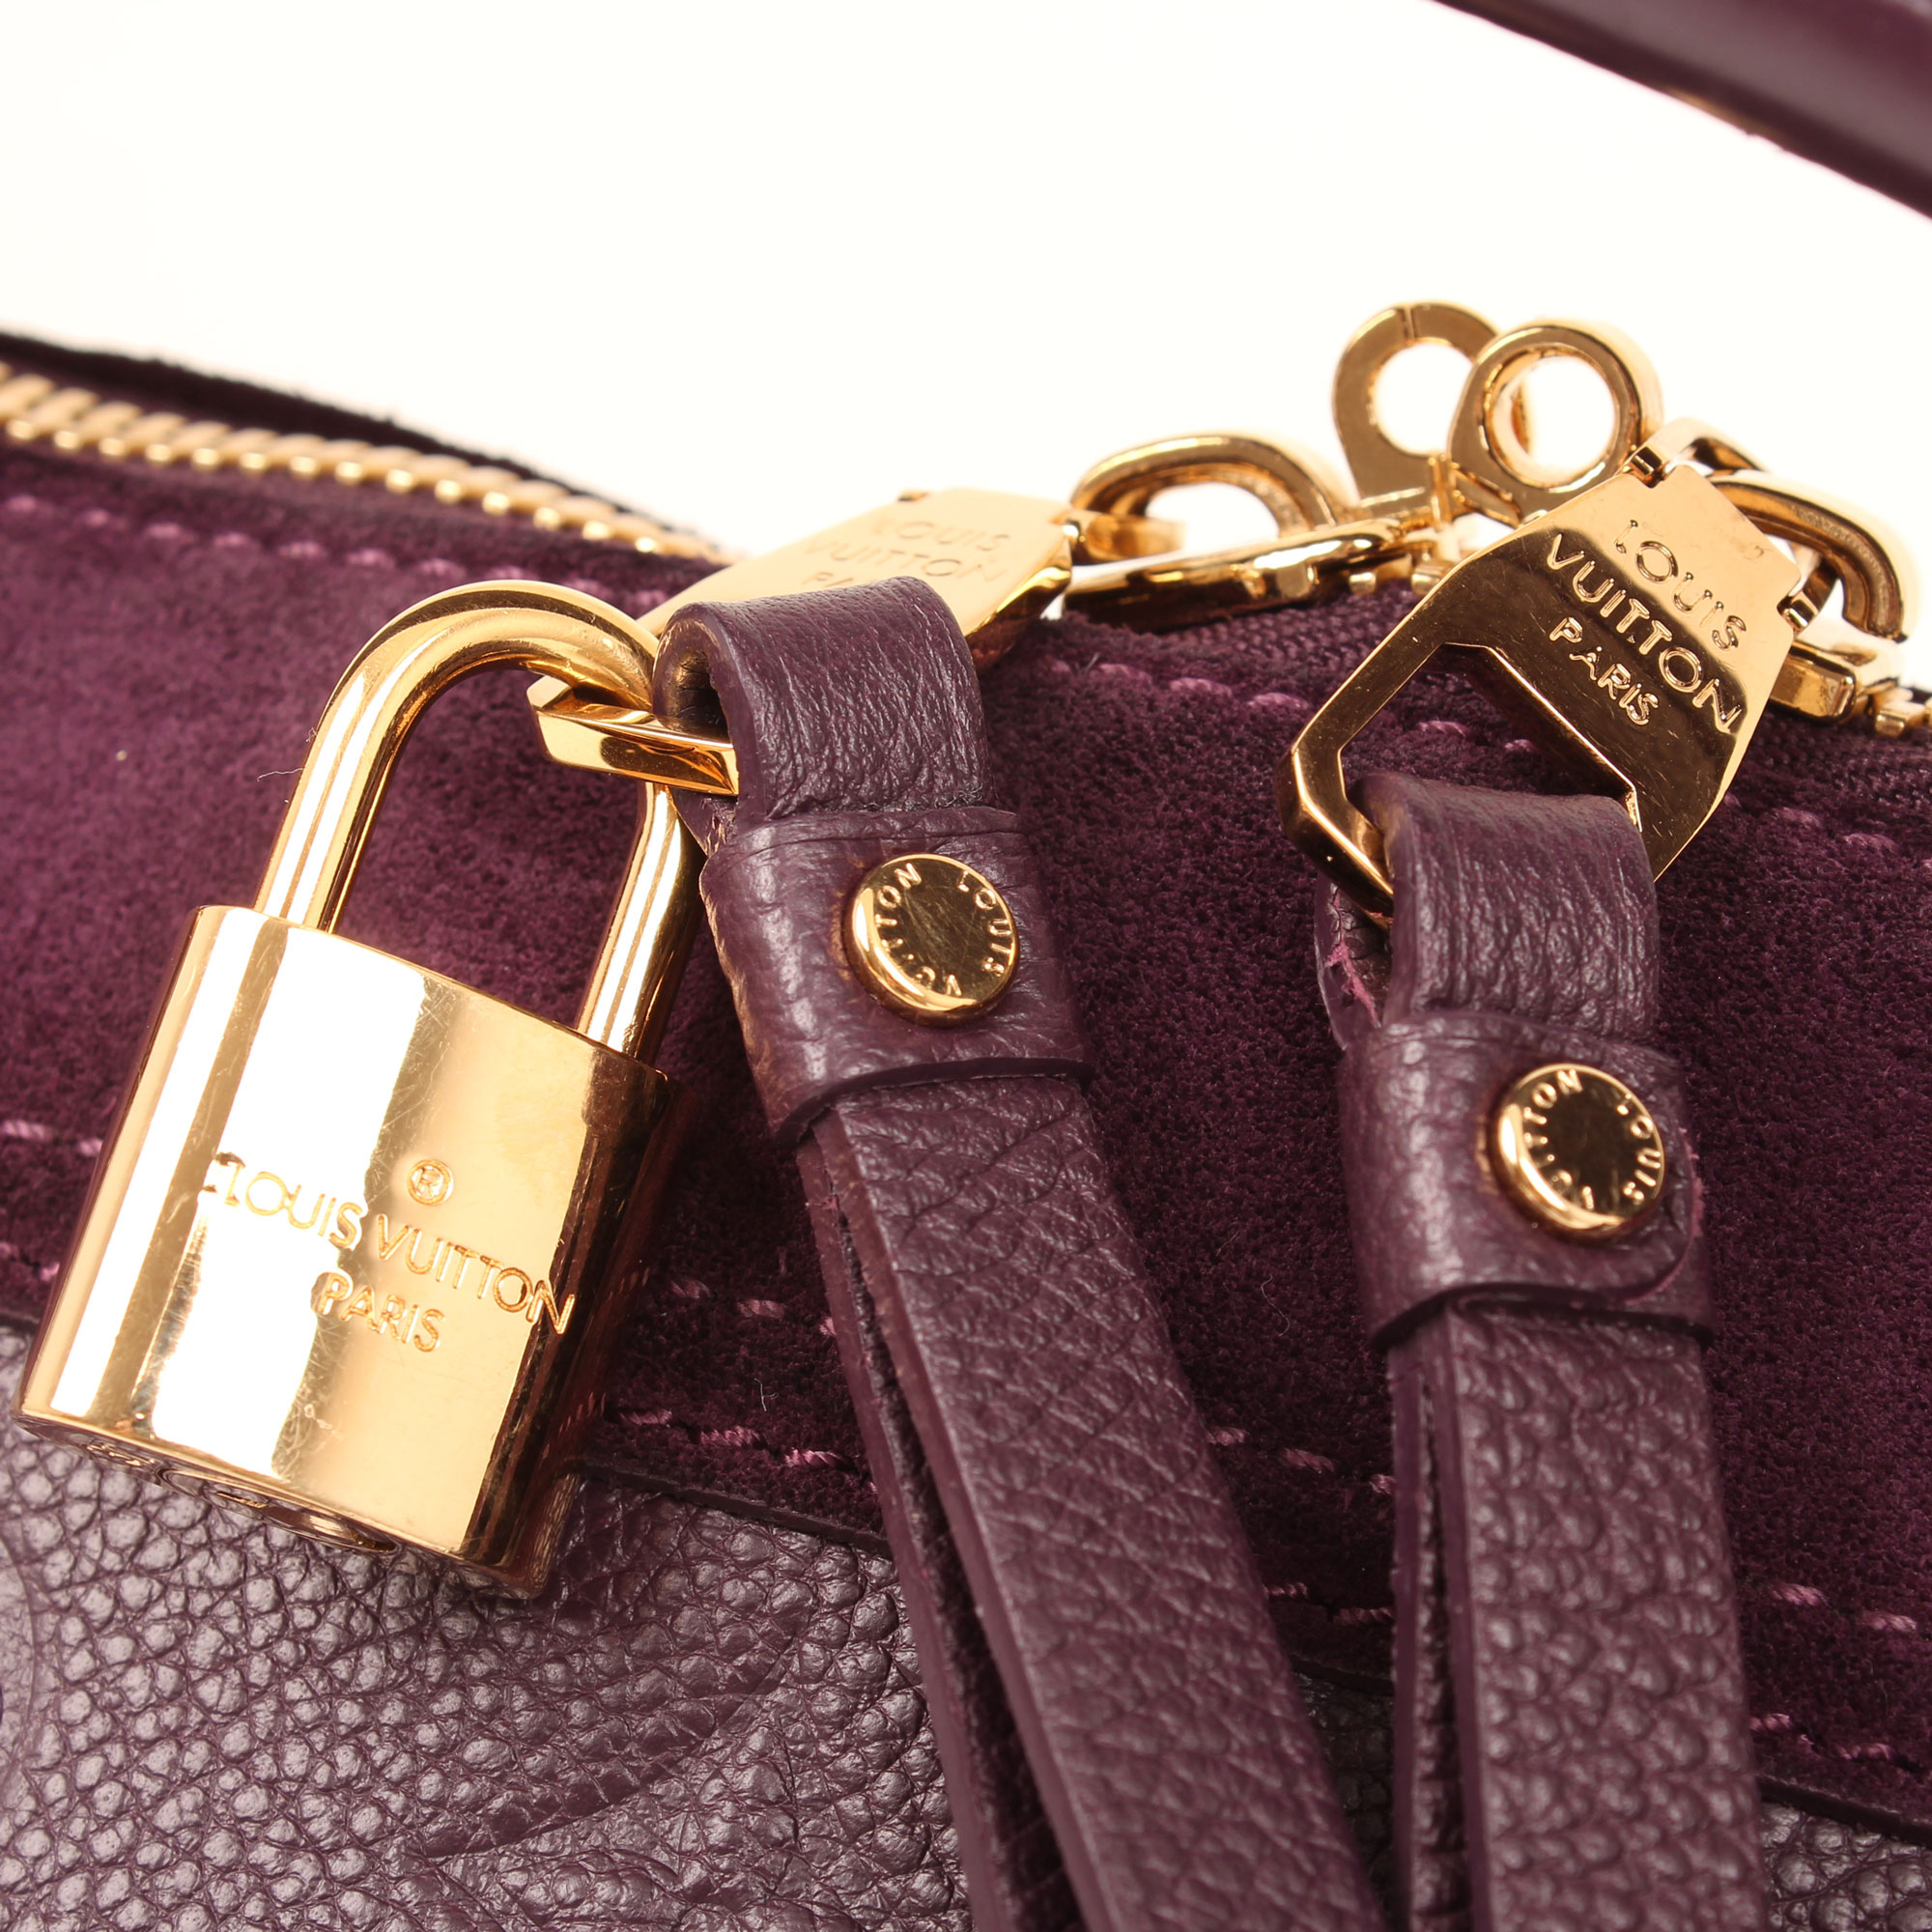 Imagen del candado del bolso louis vuitton audacieuse embossed monogram suede berenjena